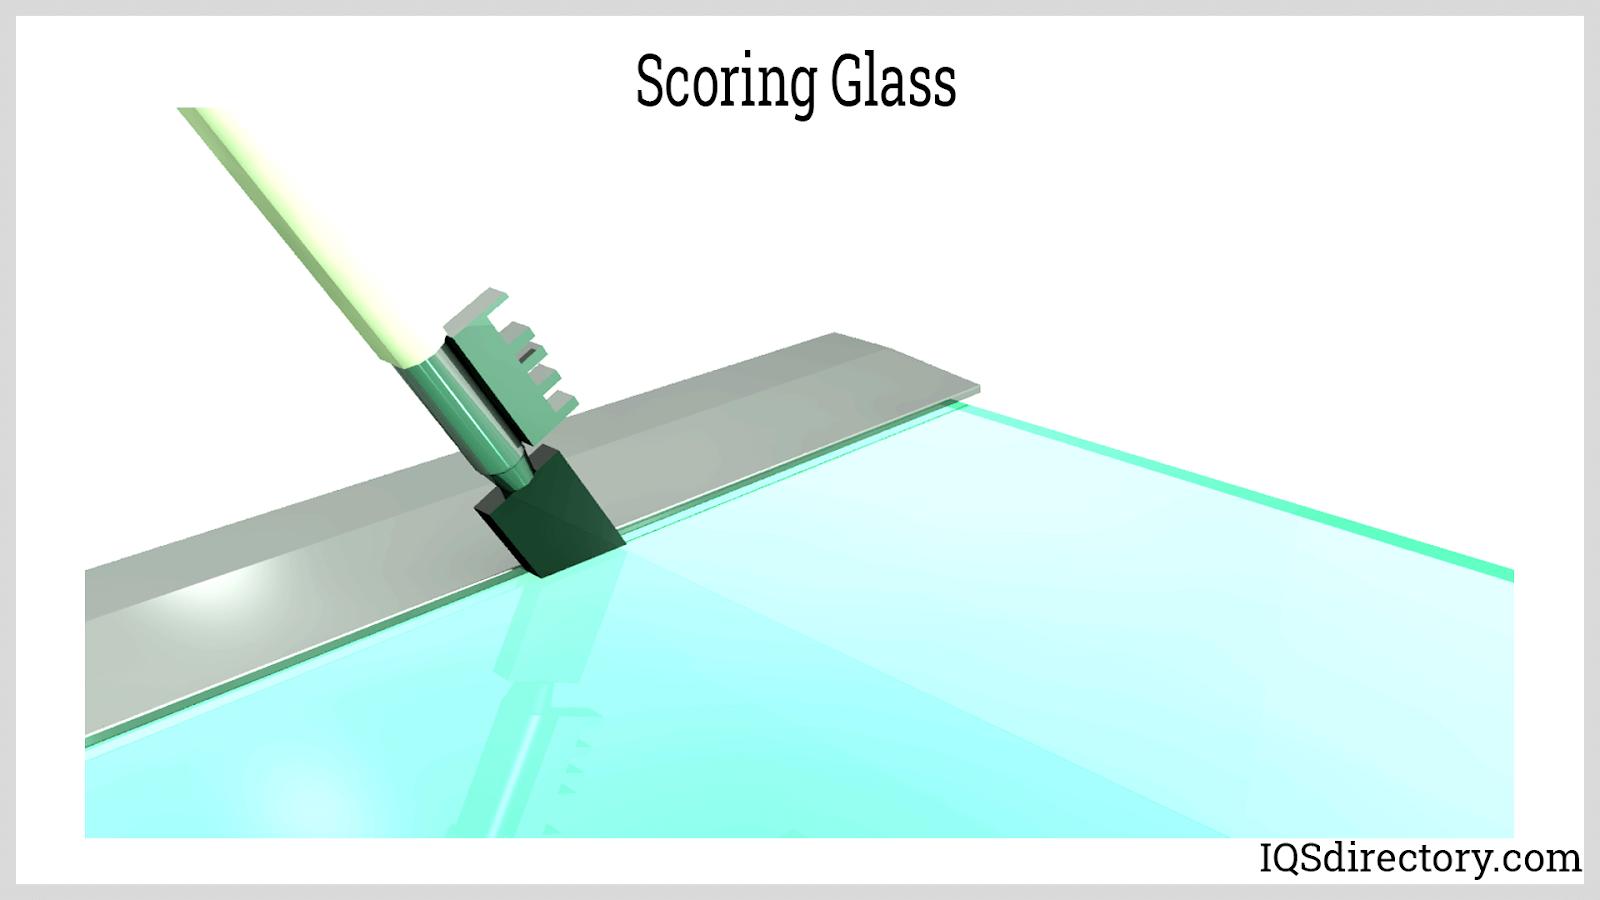 Scoring Glass